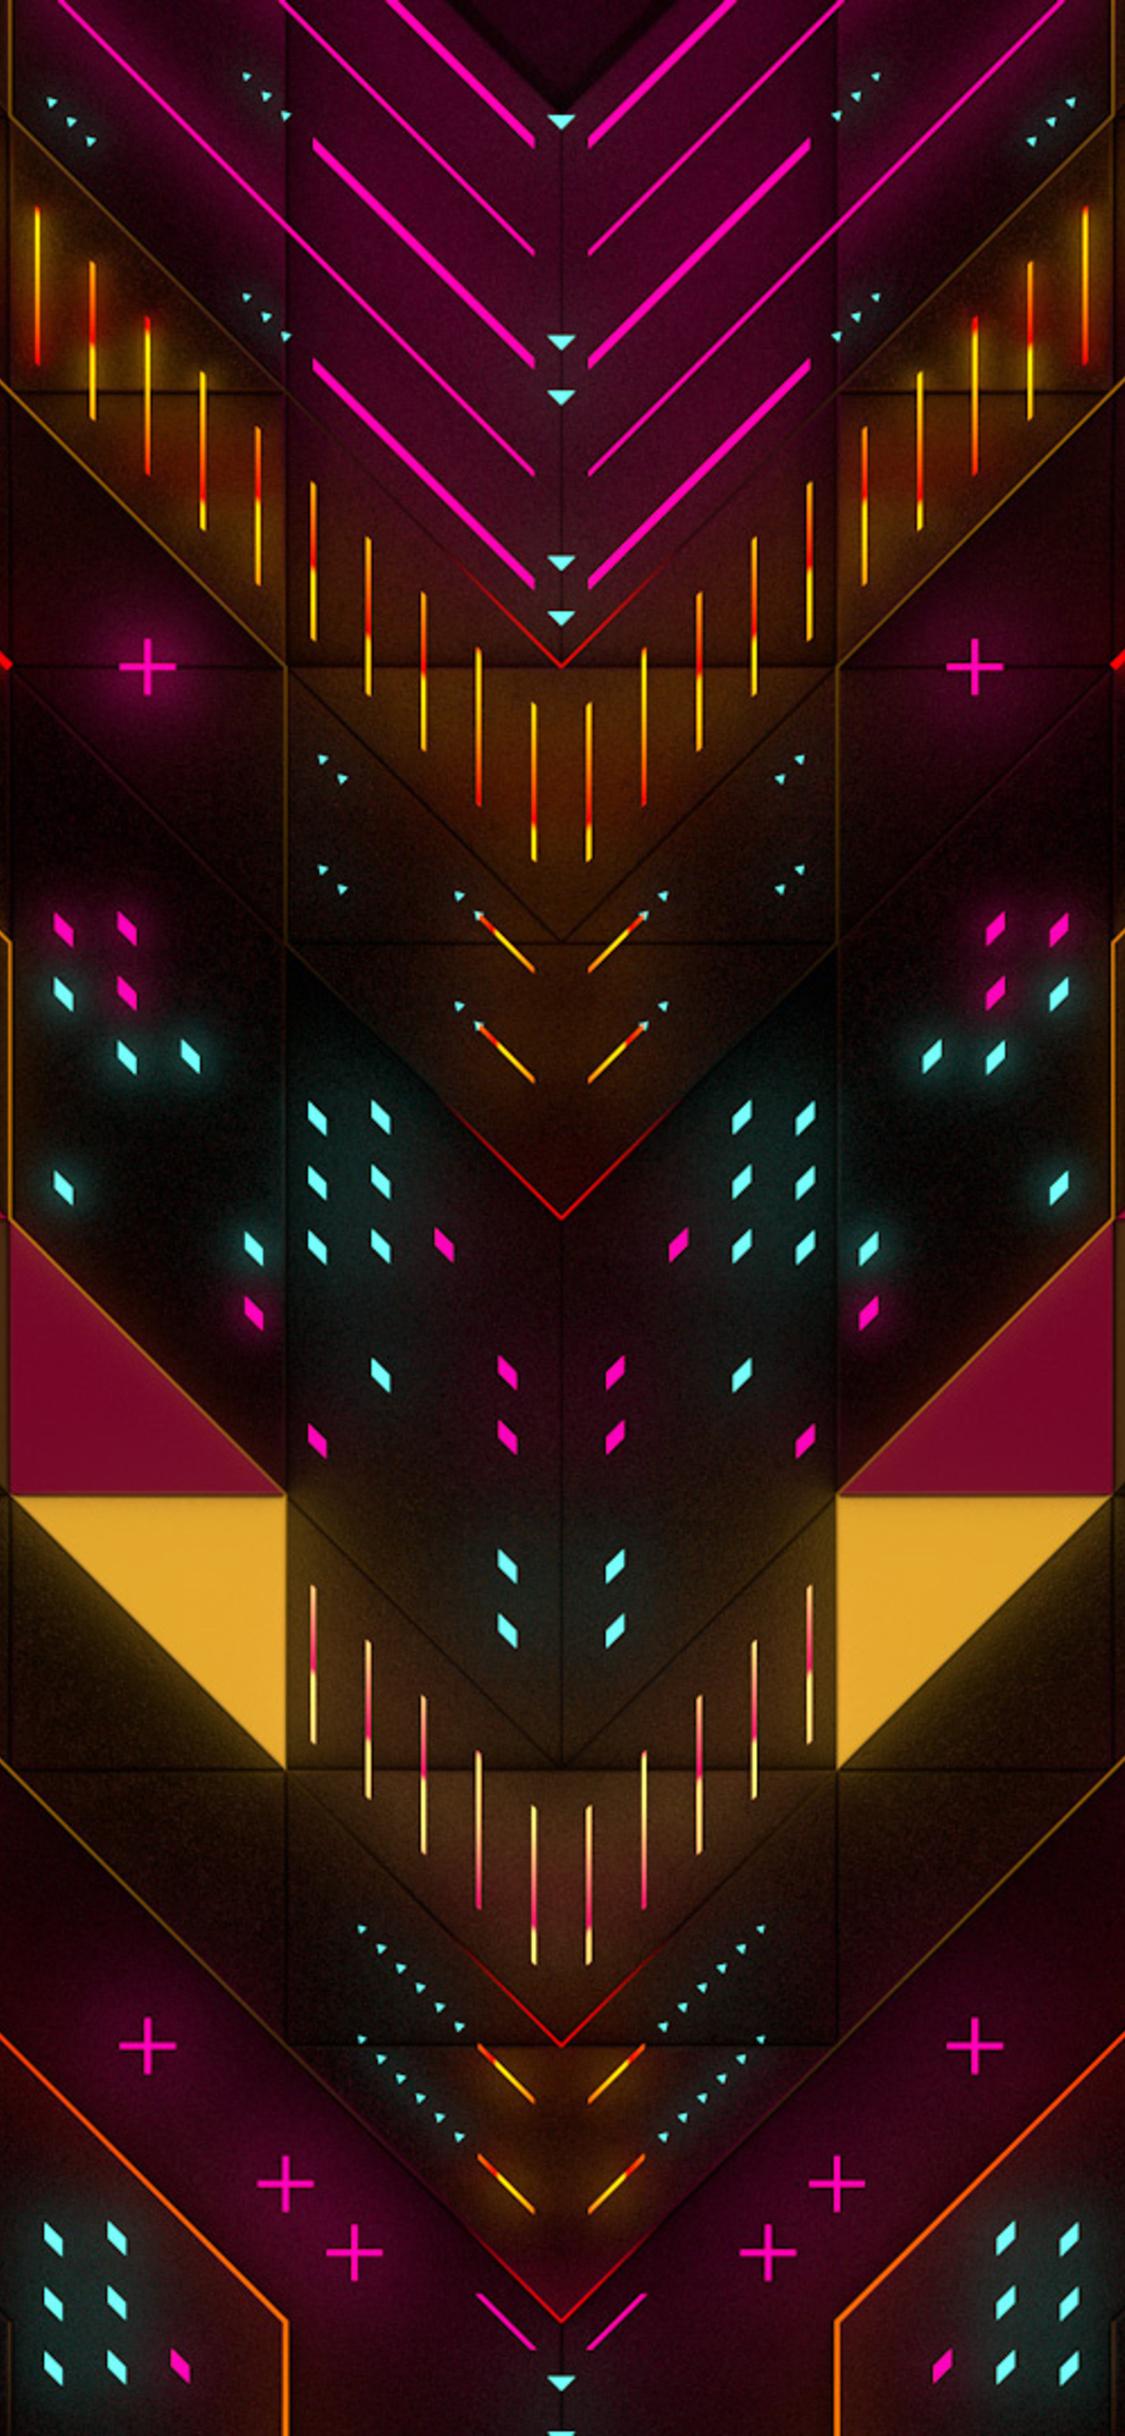 1125x2436 Neon Abstract Geometry Digital Art Iphone XS ...